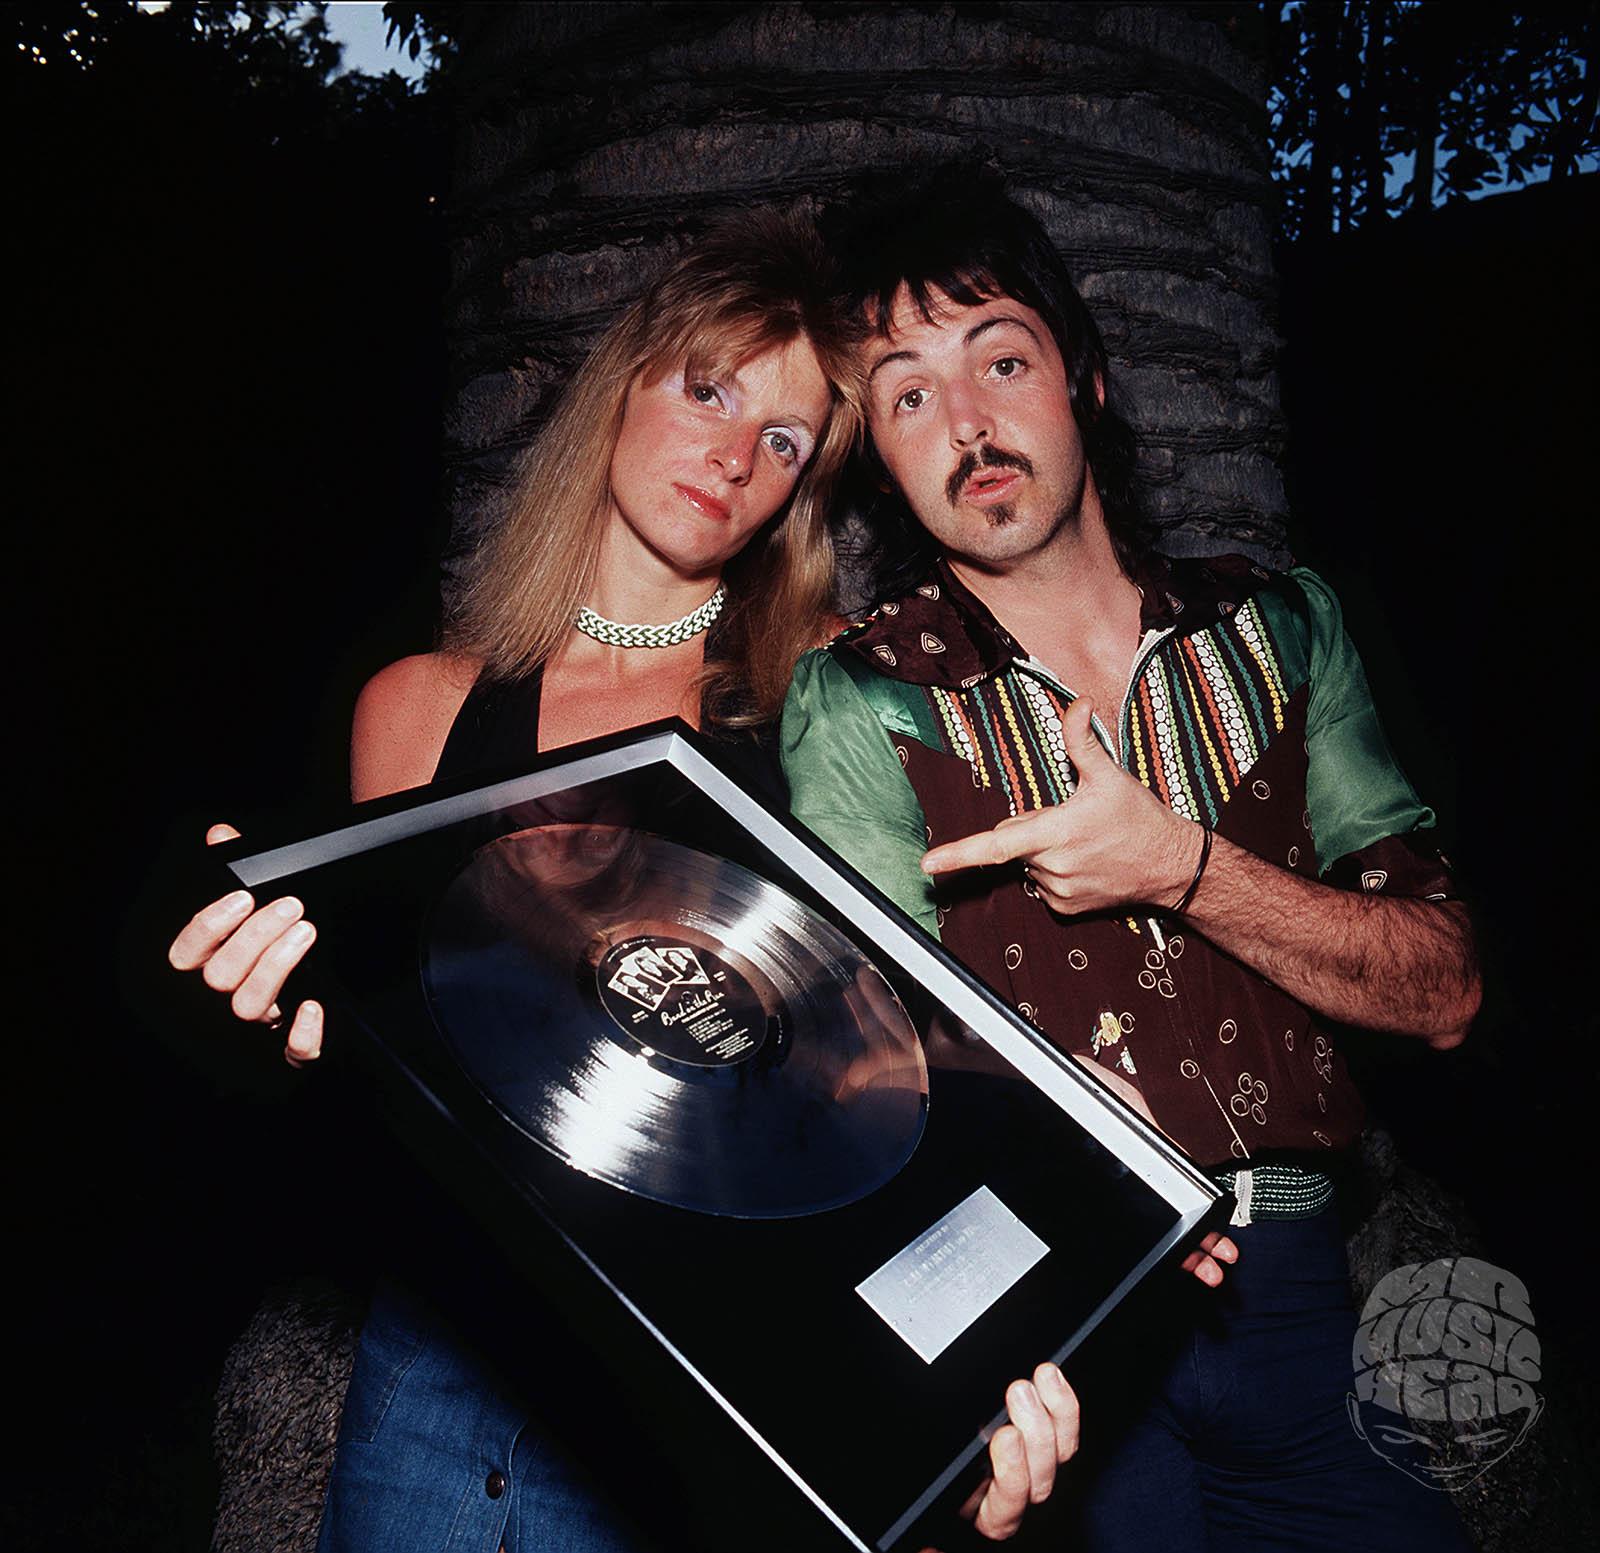 james fortune_paul linda mccartney_platinum album_band on the run_beverly hills hotel.jpg